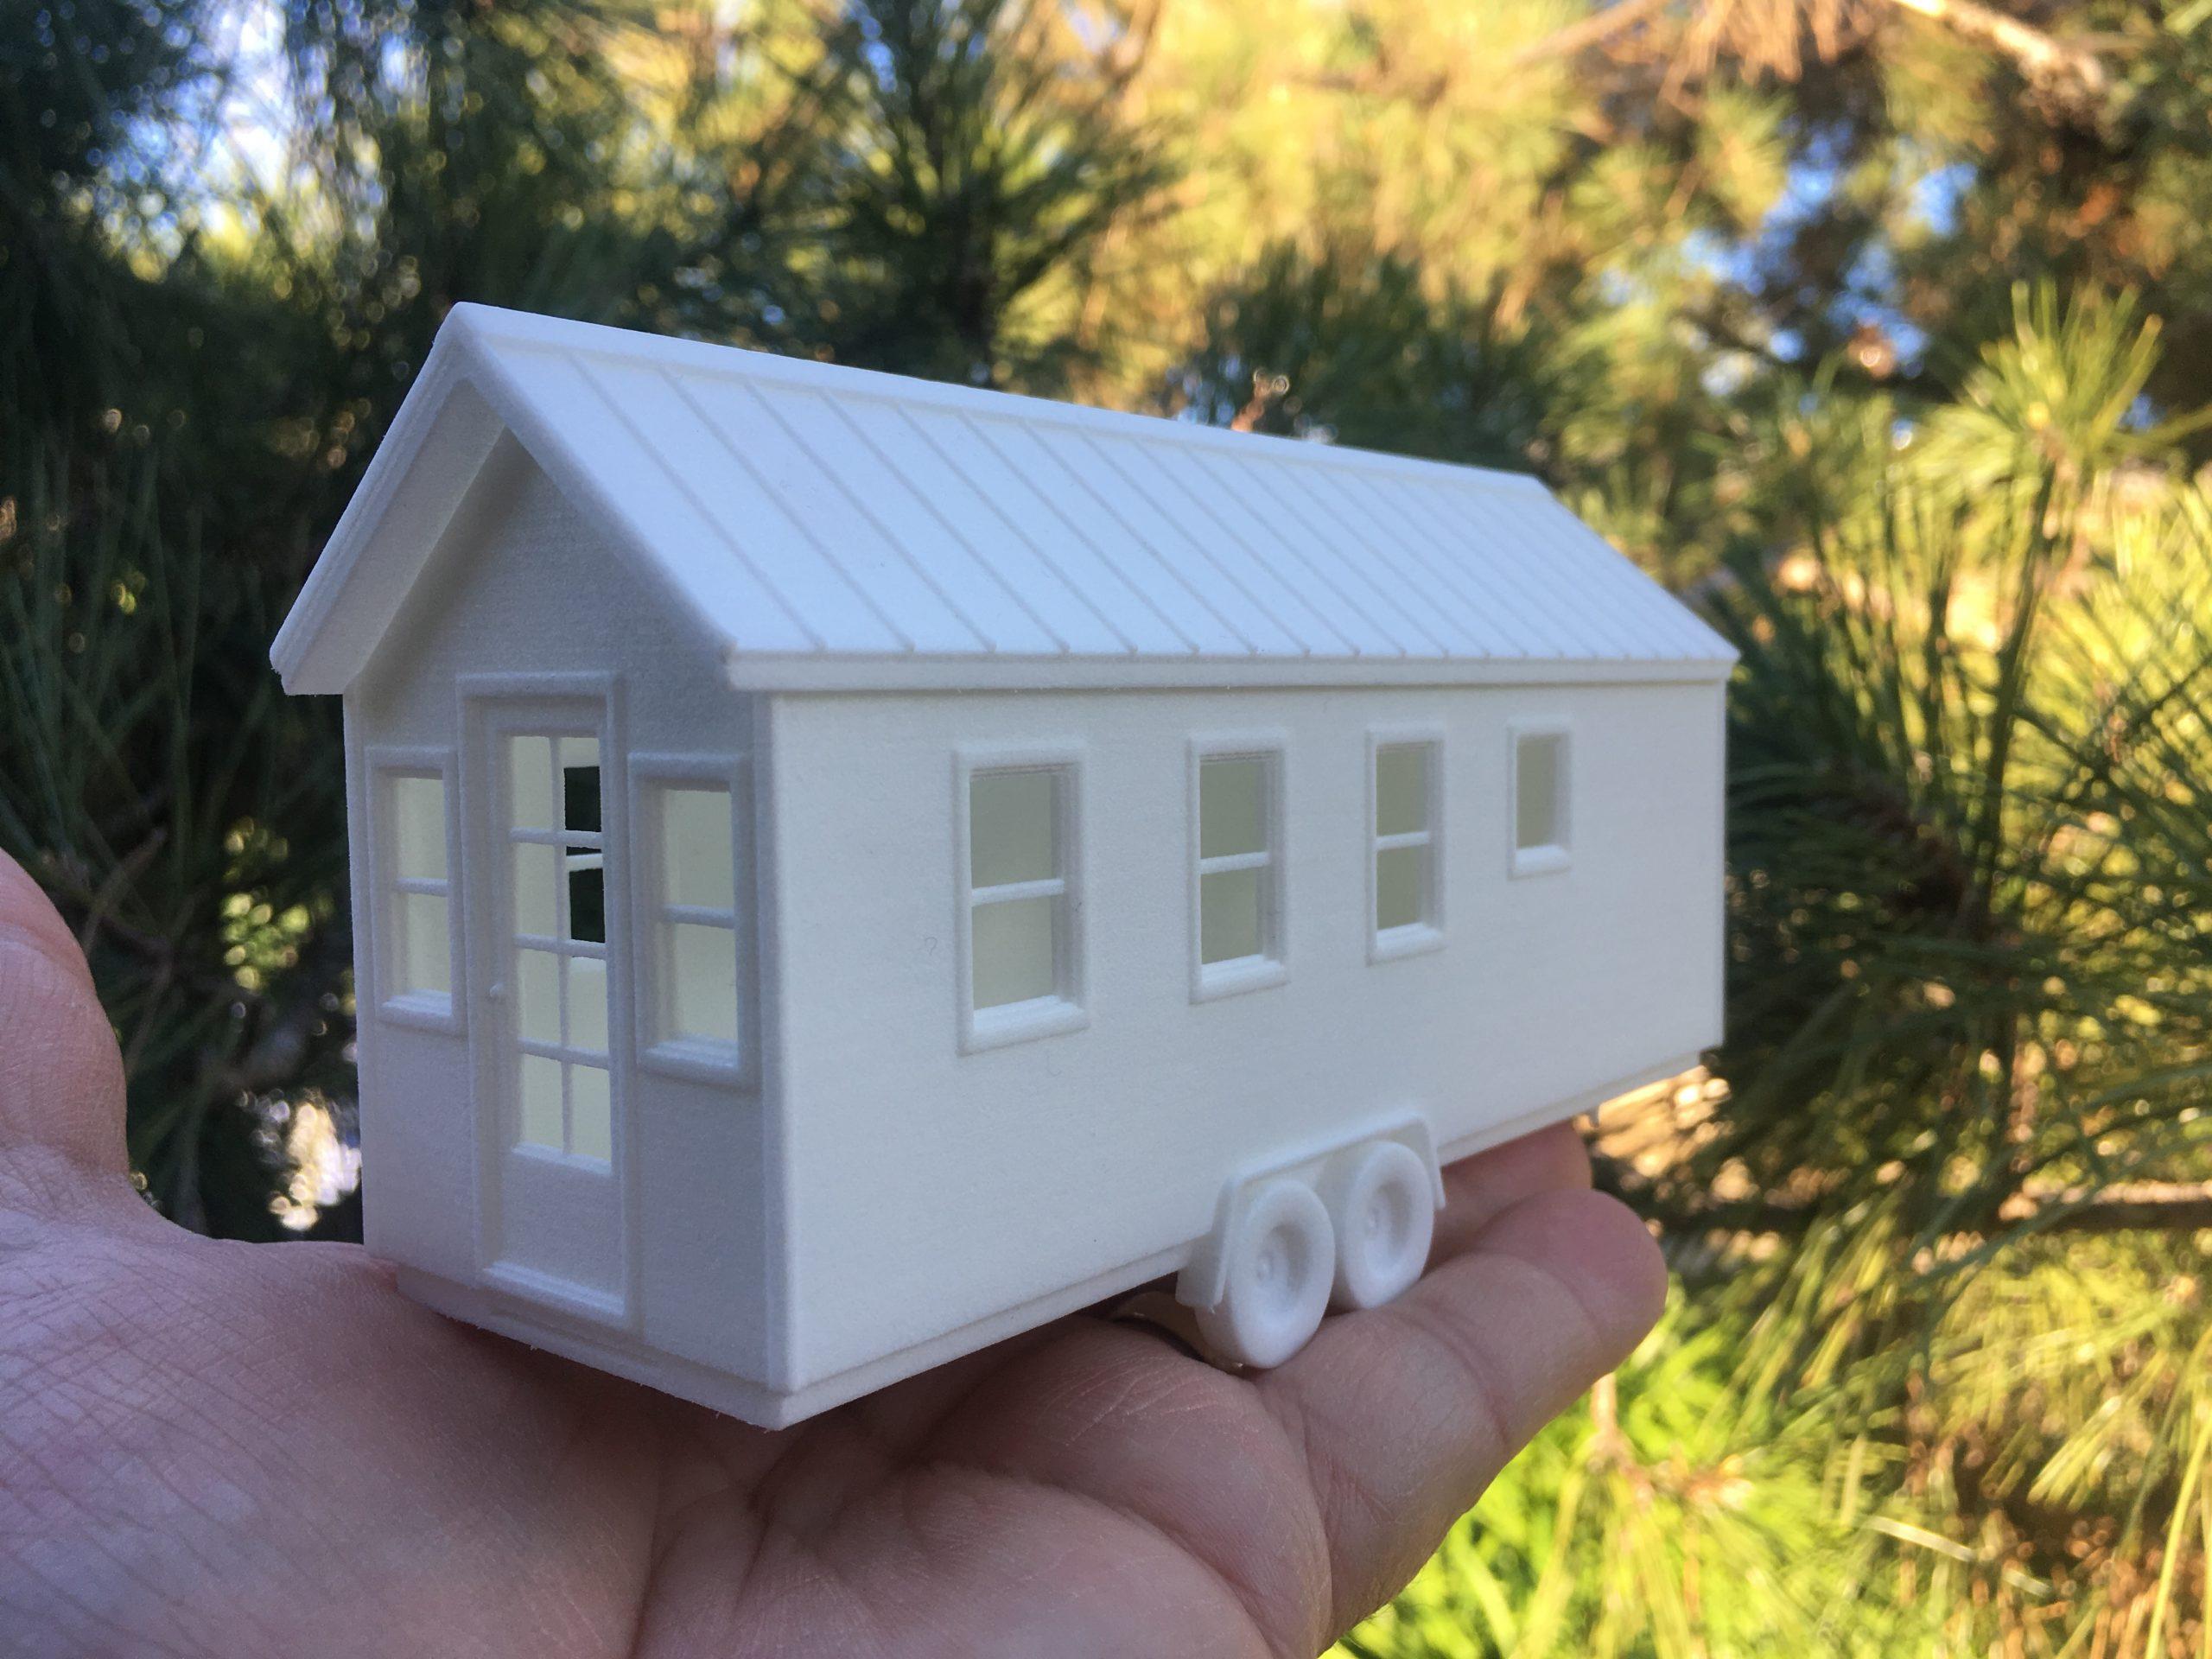 3D printed house model